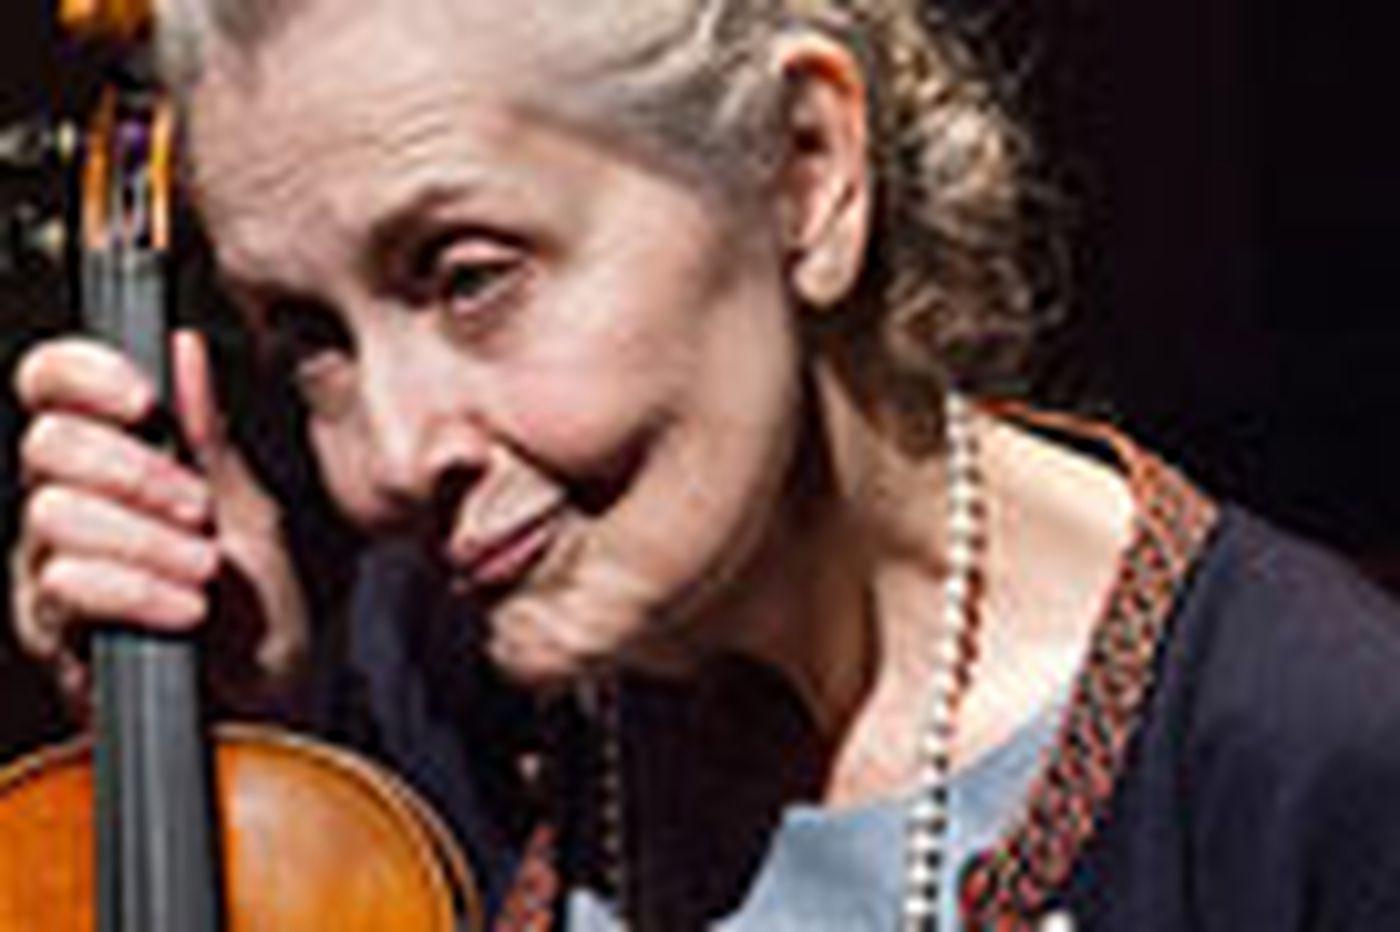 'The Morini Strad,' a violinist's story